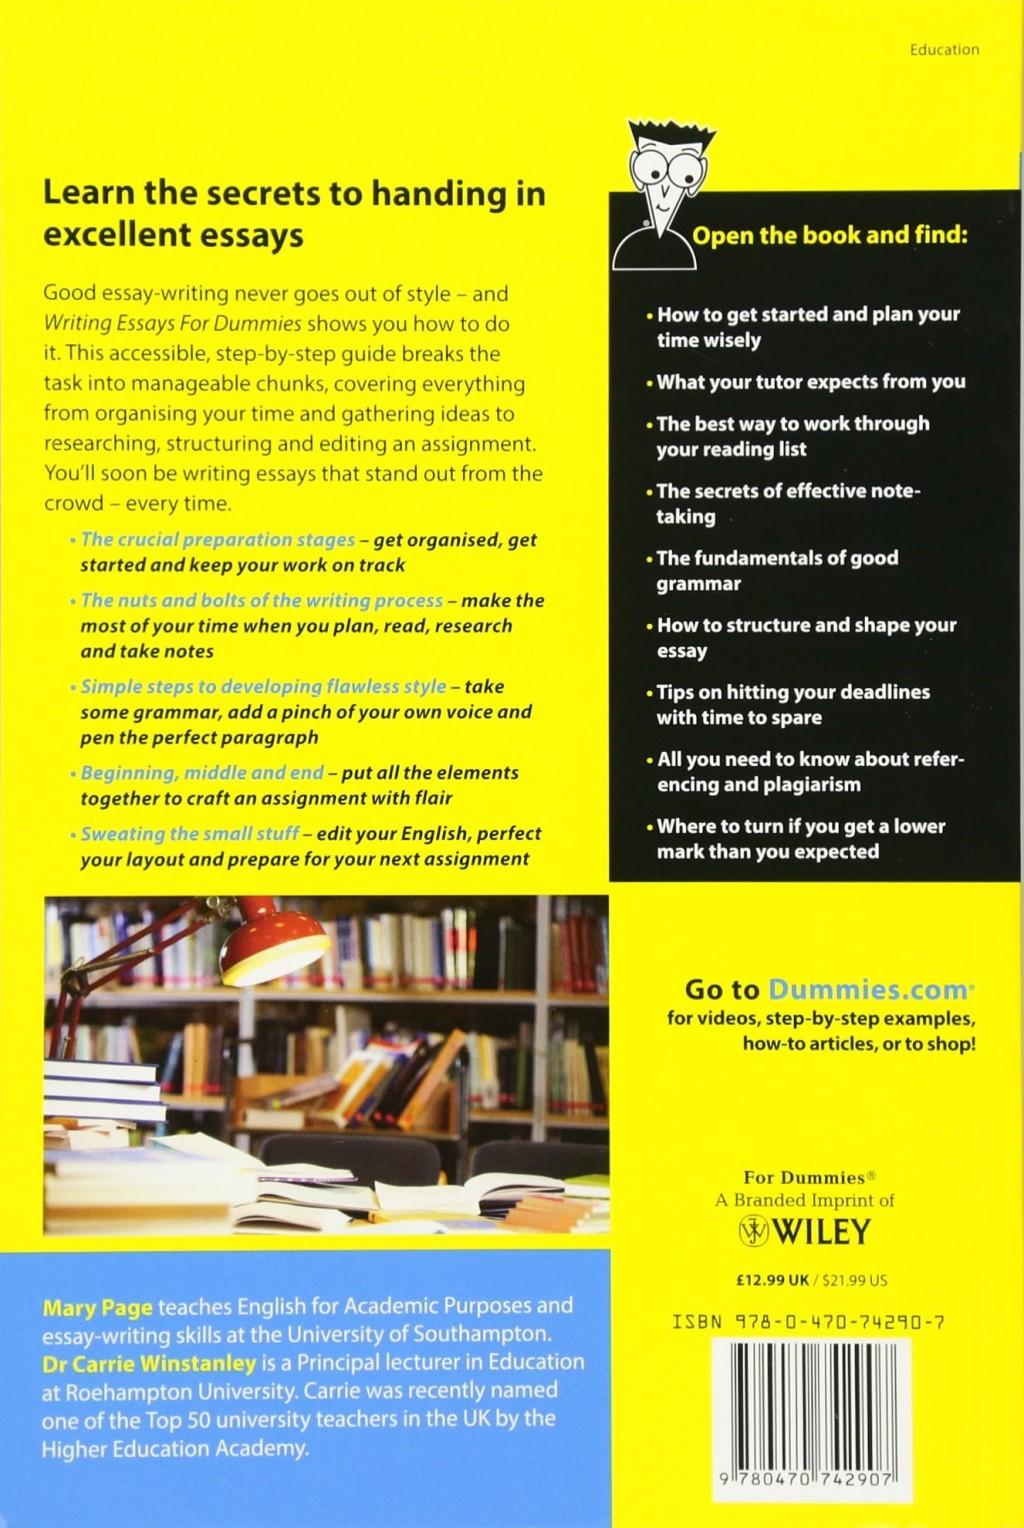 001 81ezsvpvmal Writing Essays For Dummies Essay Wondrous Pdf Free Download Cheat Sheet Large